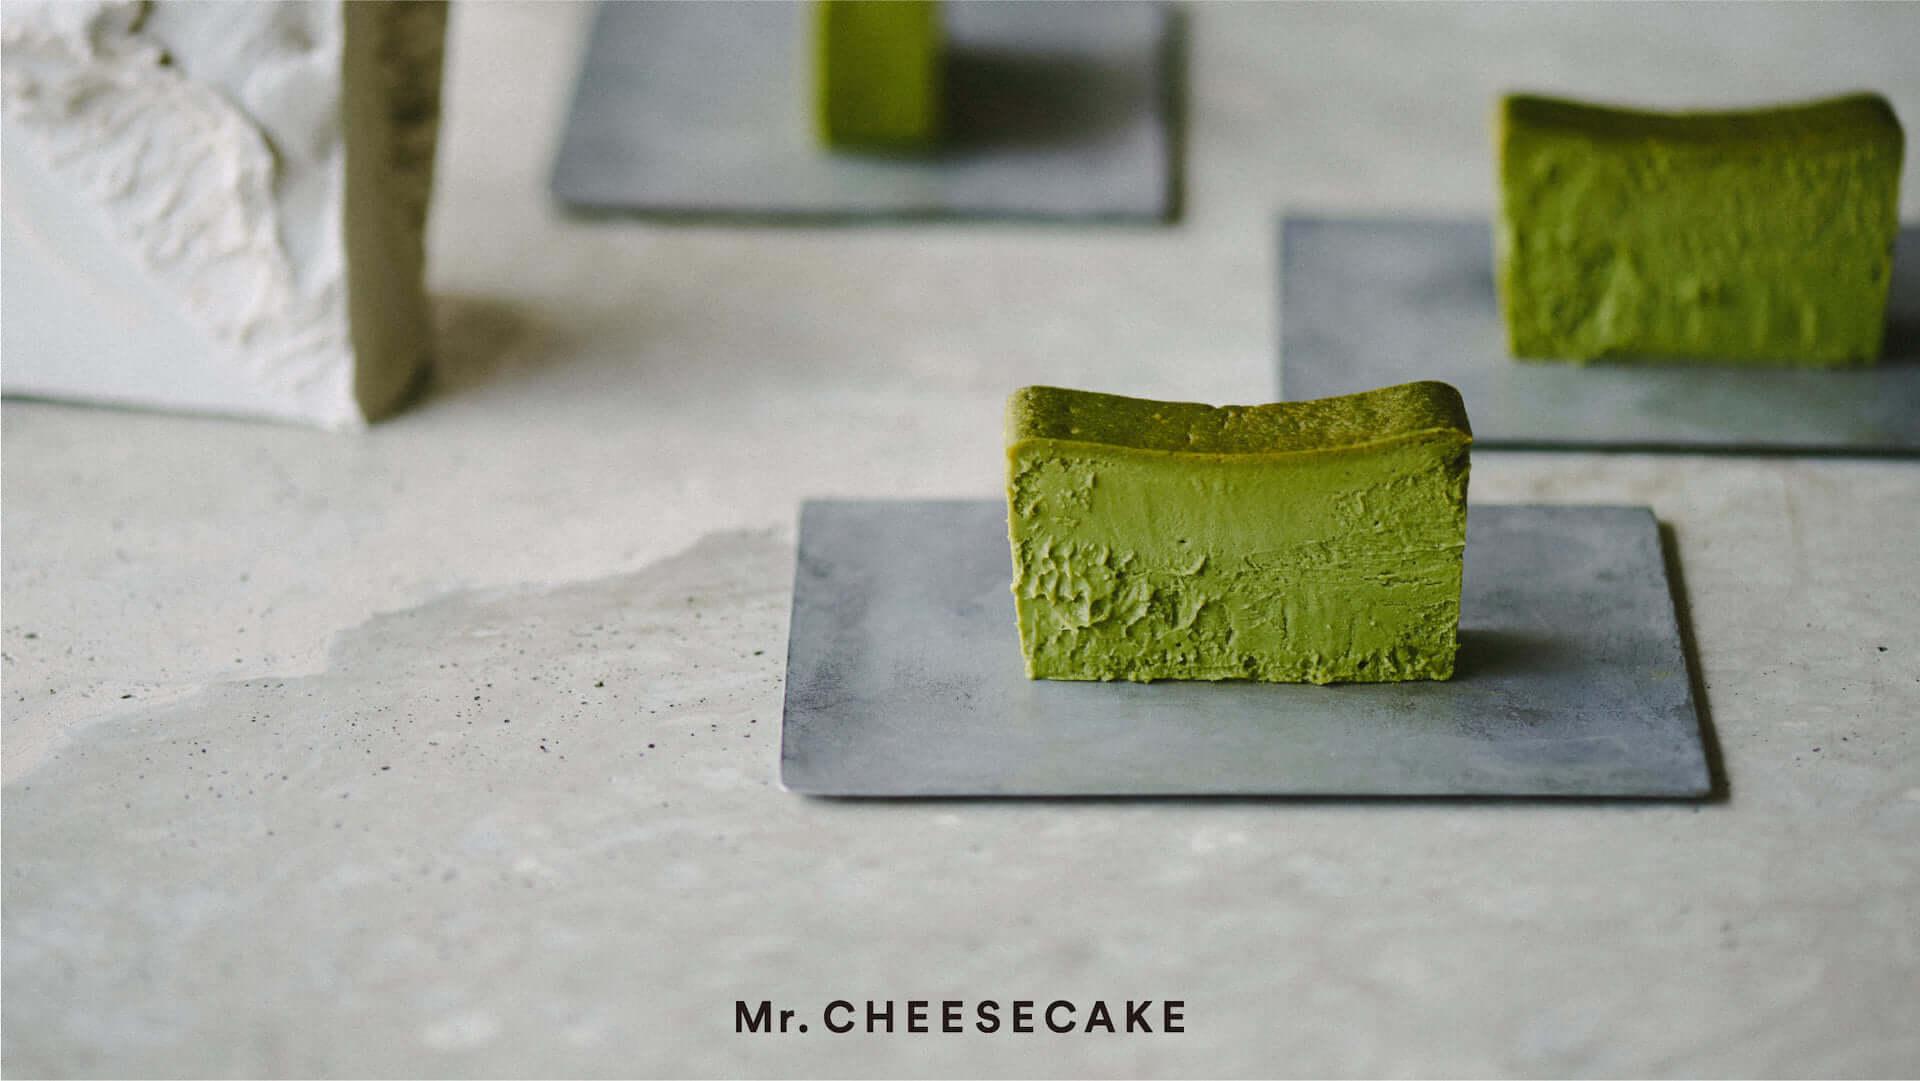 Mr. CHEESECAKE誕生3周年記念!希少な抹茶を使用したチーズケーキ『Mr. CHEESECAKE Oribe』が数量限定で登場 gourmet210322_mrcheesecake-tearoom_13-1920x1081